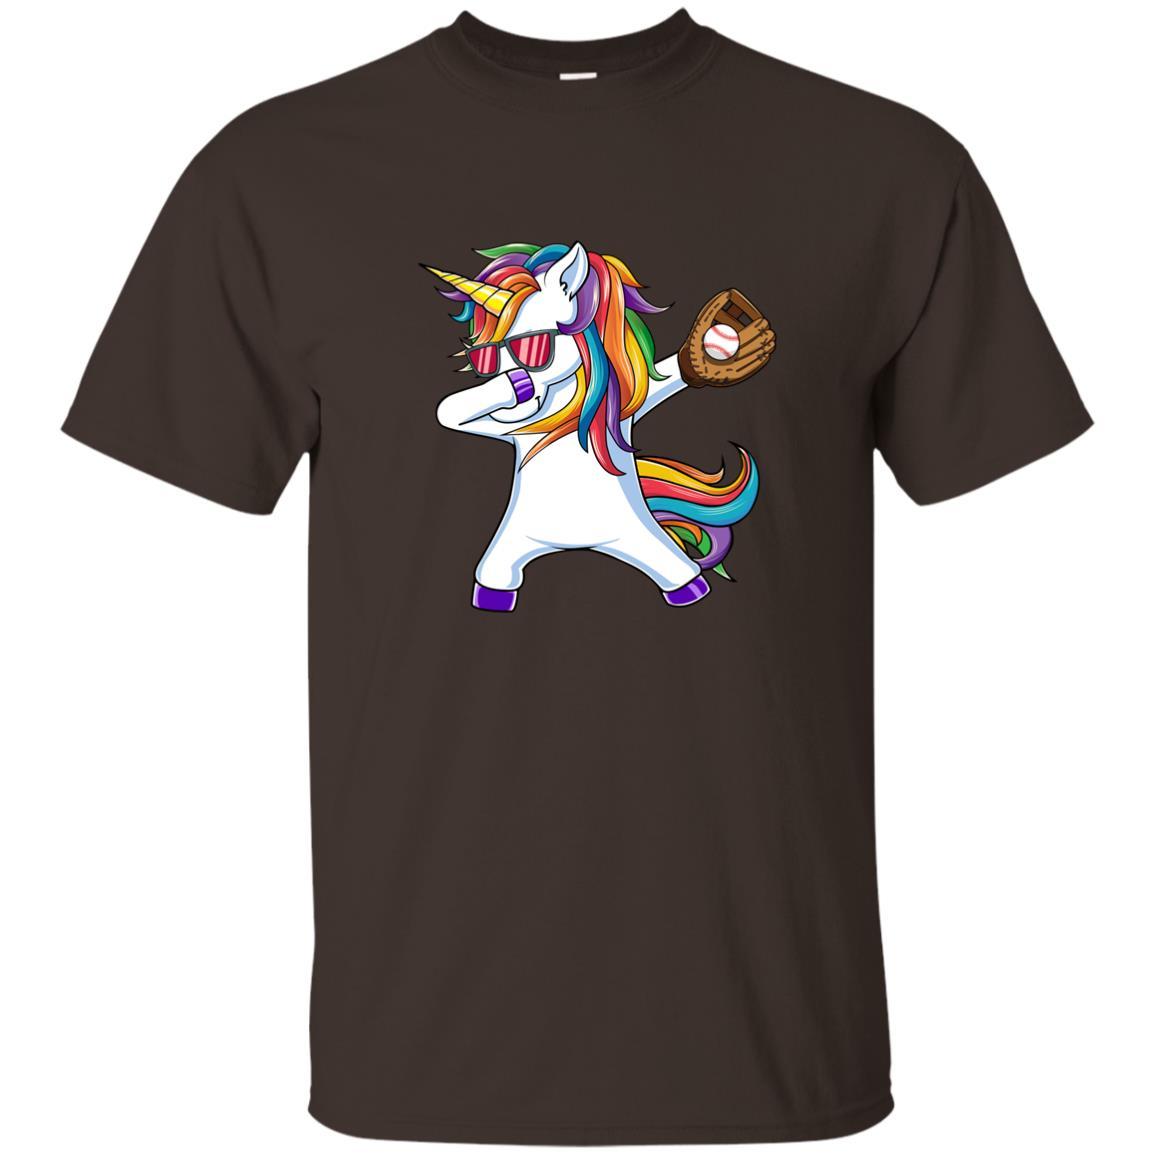 Dabbing Unicorn Baseball Kids Funny Dab Dance Gift Unisex Short Sleeve